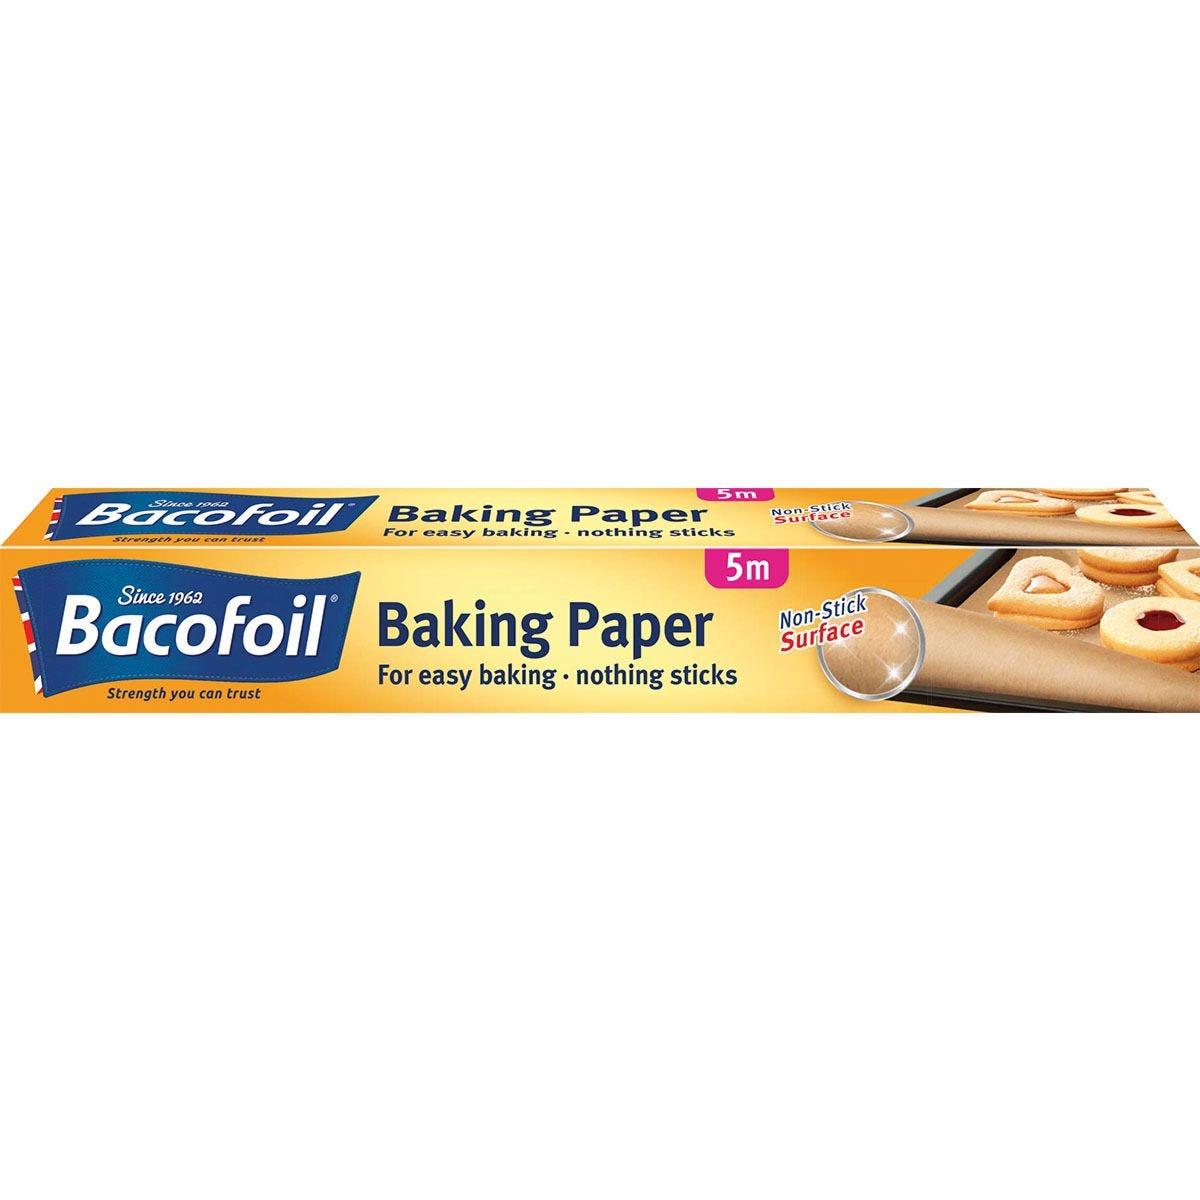 Bacofoil Non-Stick Baking Paper - 5 metres